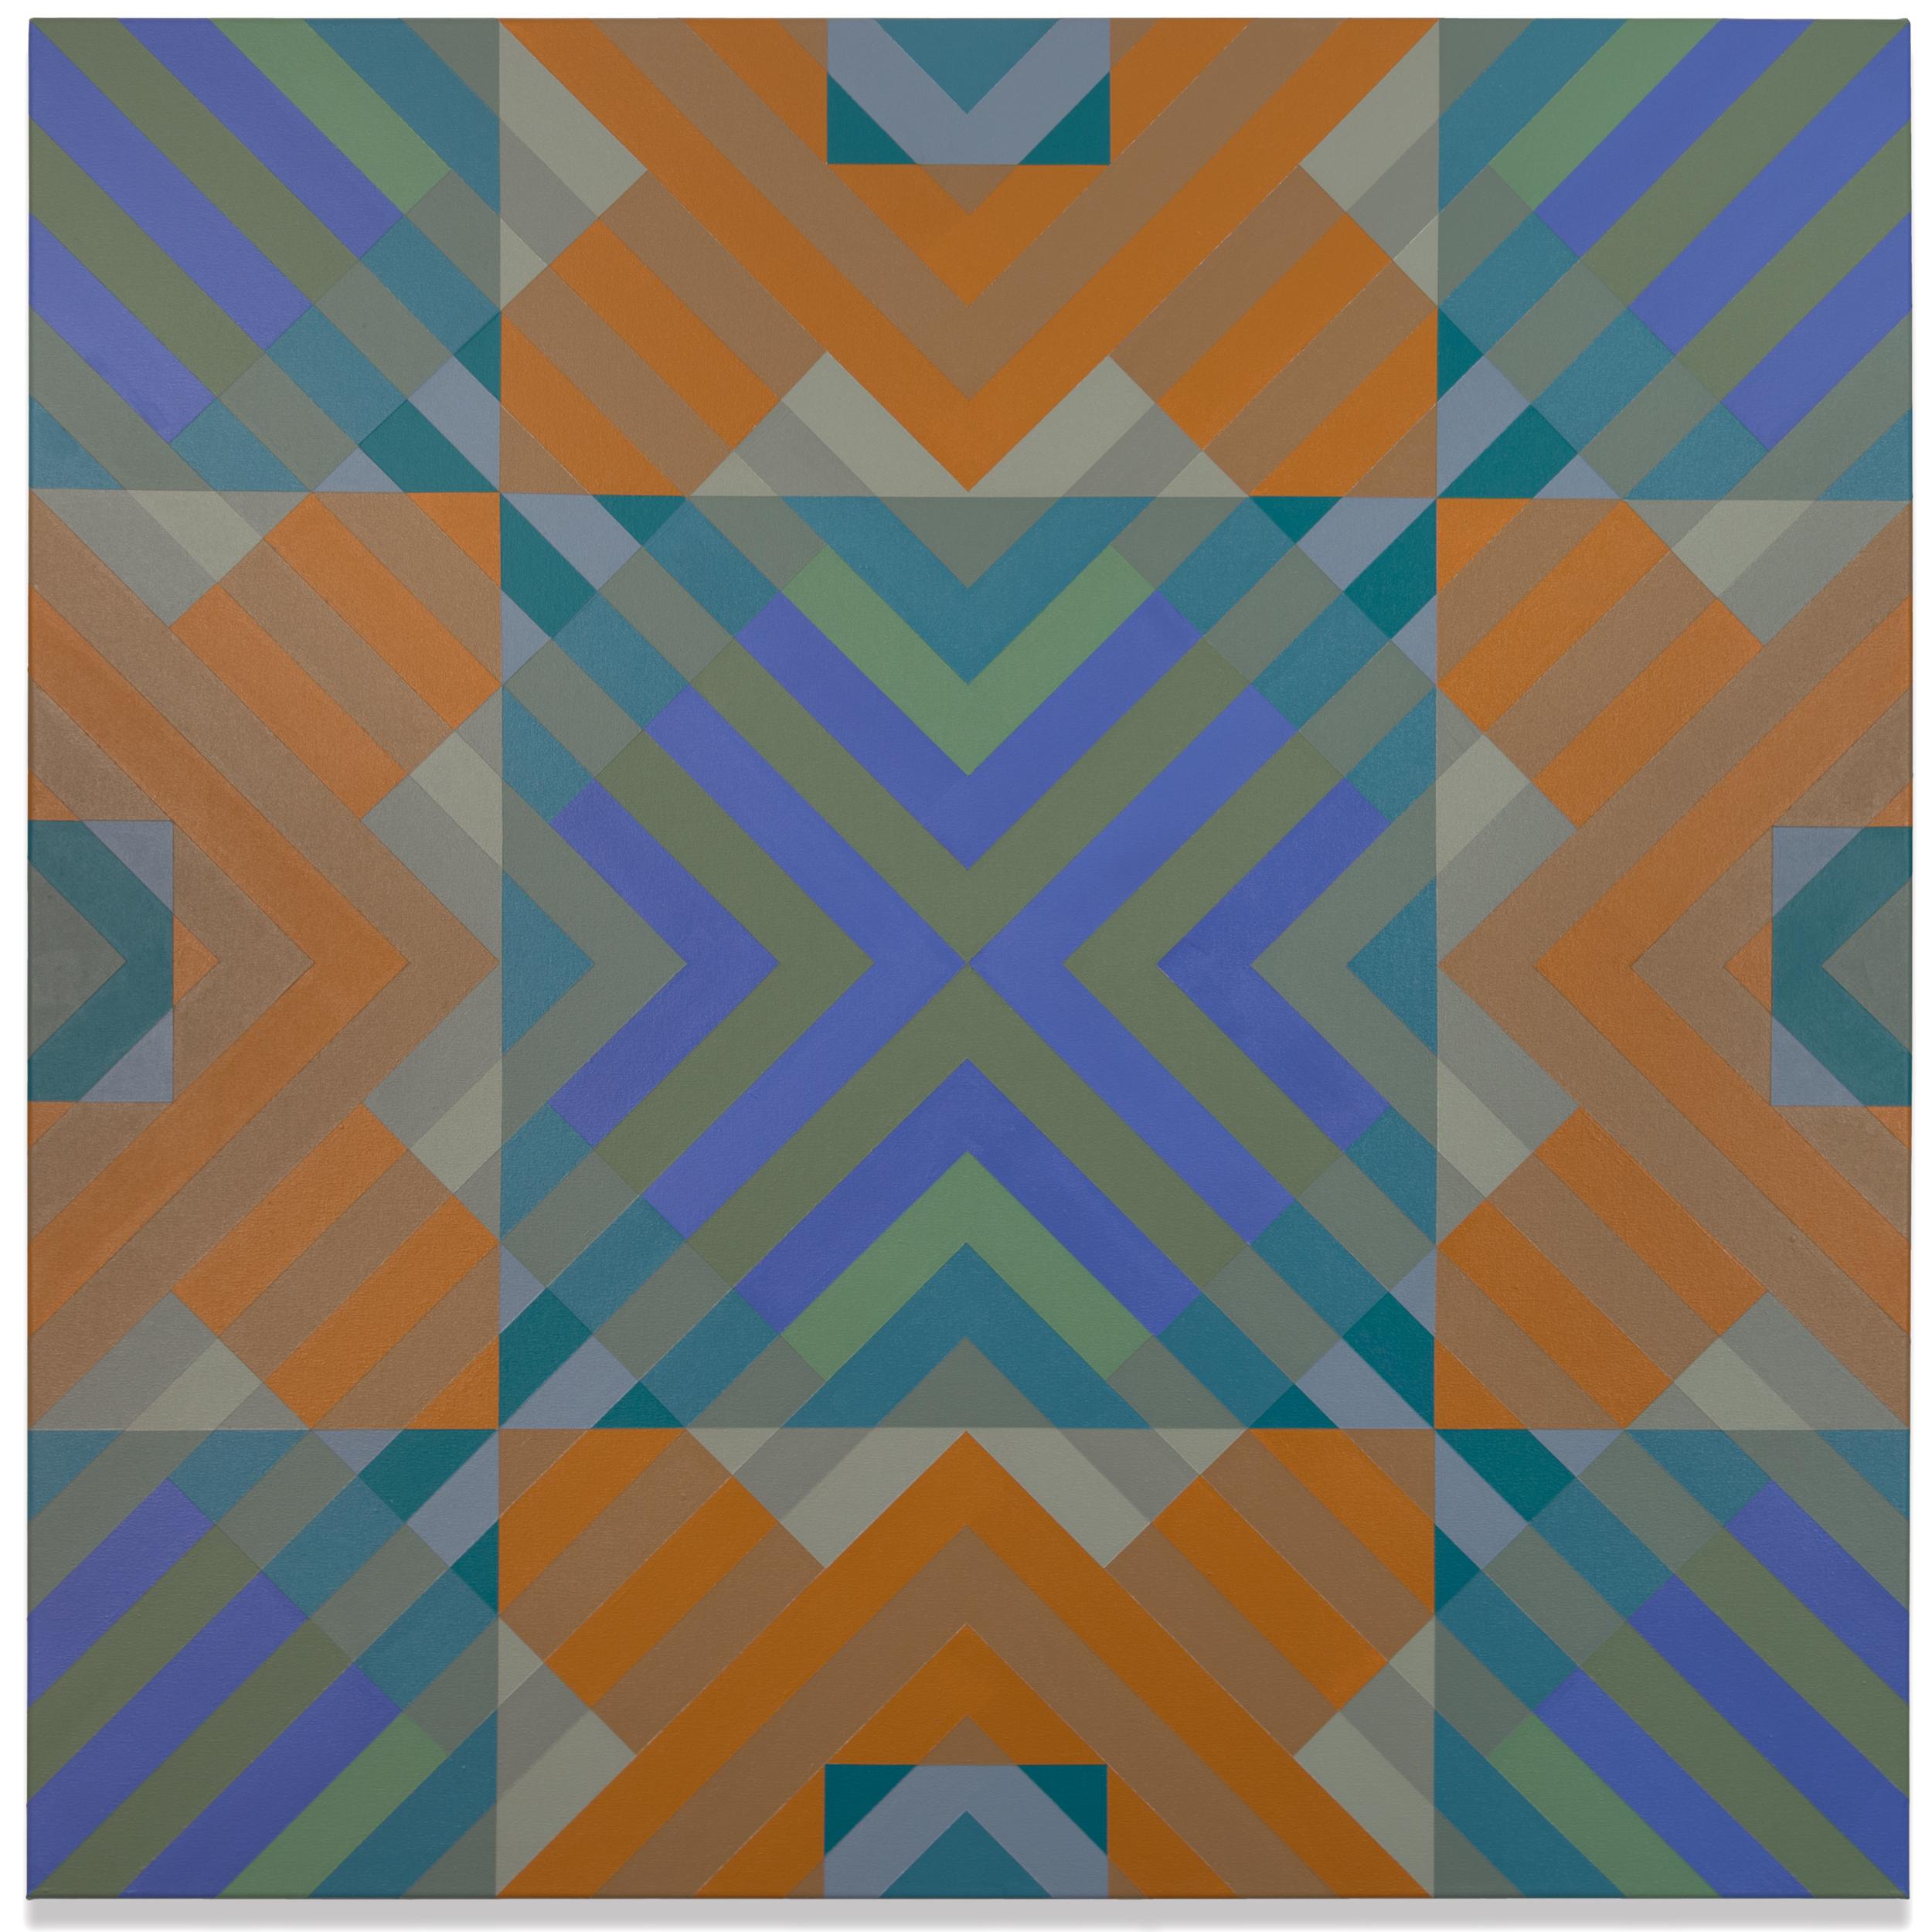 Qualia 415  acrylic on canvas 48 x 48 inches 2017